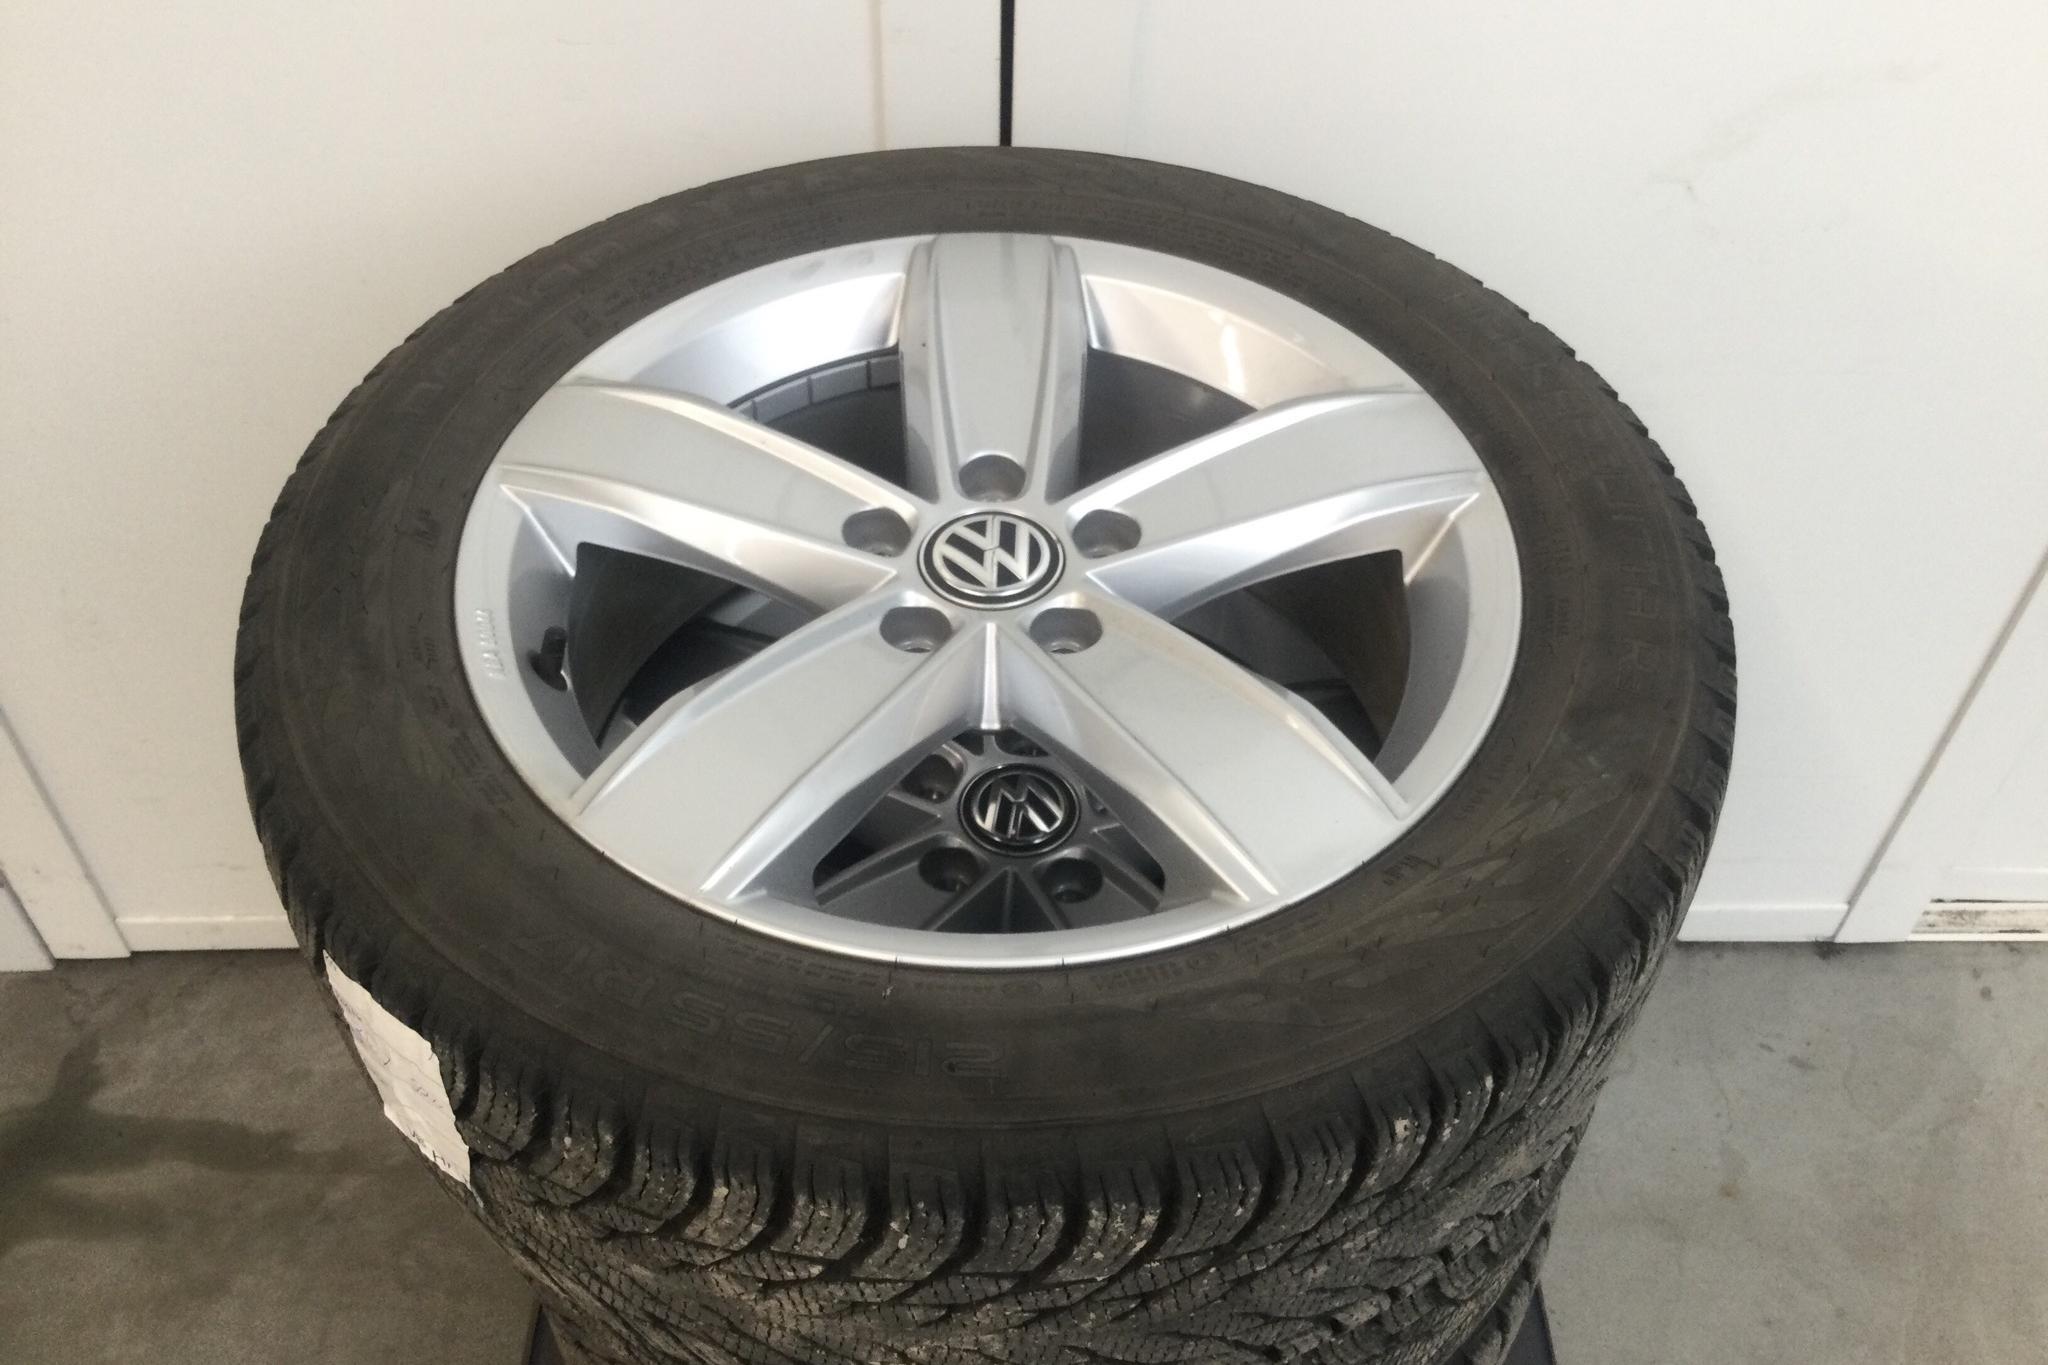 VW Passat 1.4 Plug-in-Hybrid Sportscombi (218hk) - 51 480 km - Automatic - silver - 2018